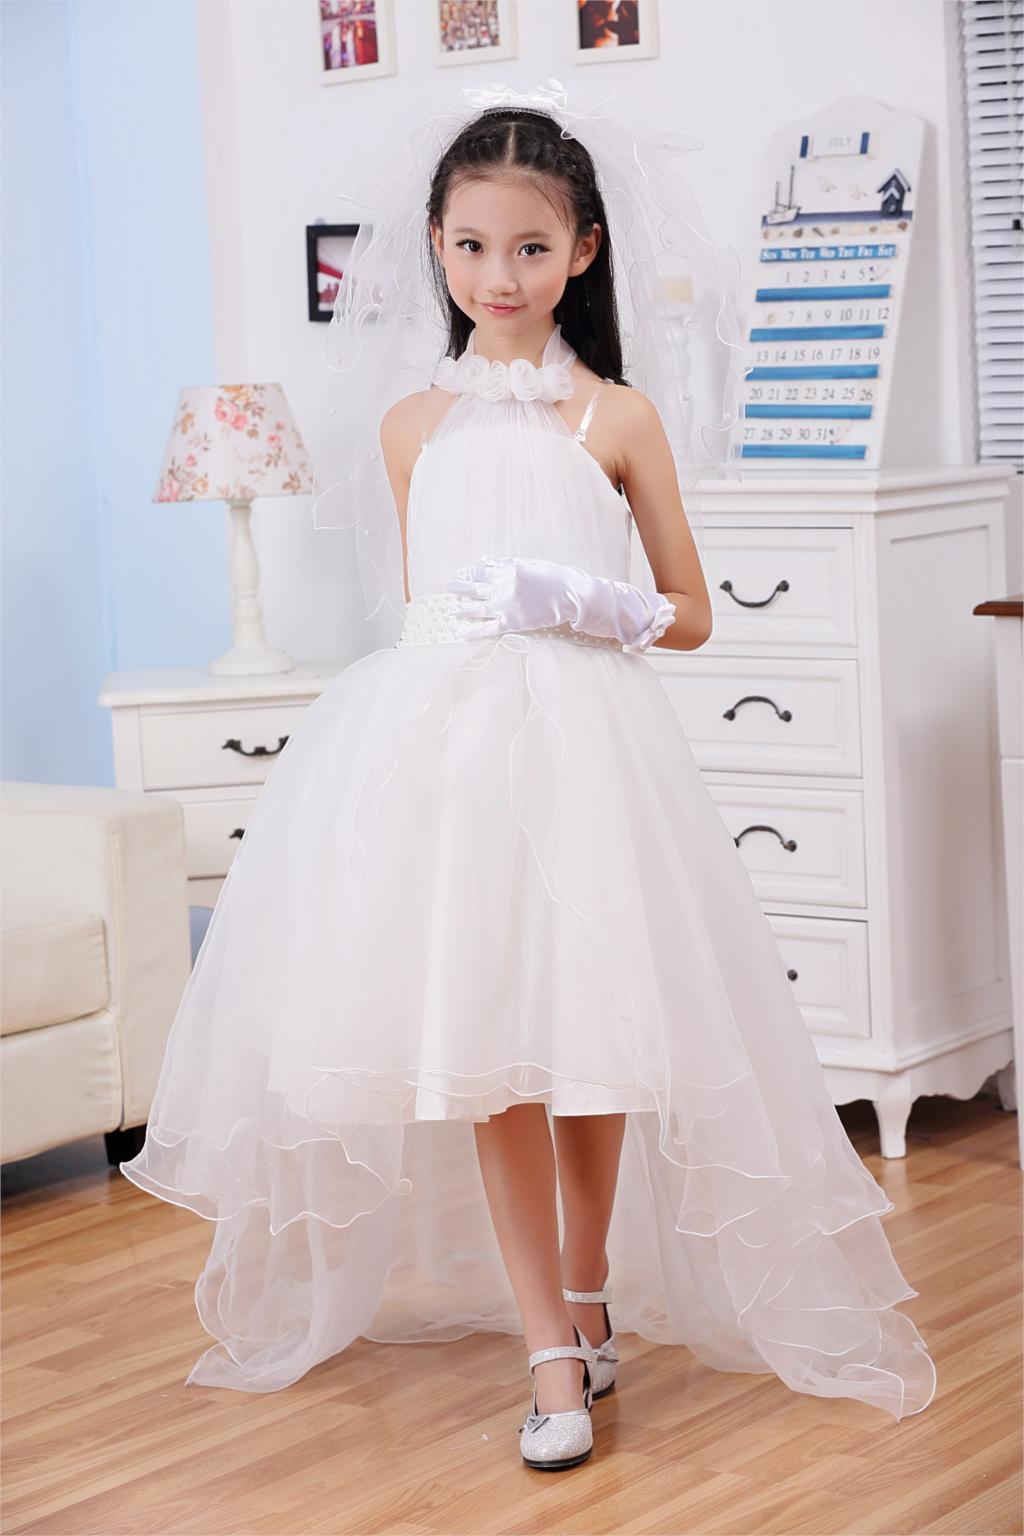 79f2b053c4 Cute Formal Dresses For 11 Year Olds - Data Dynamic AG